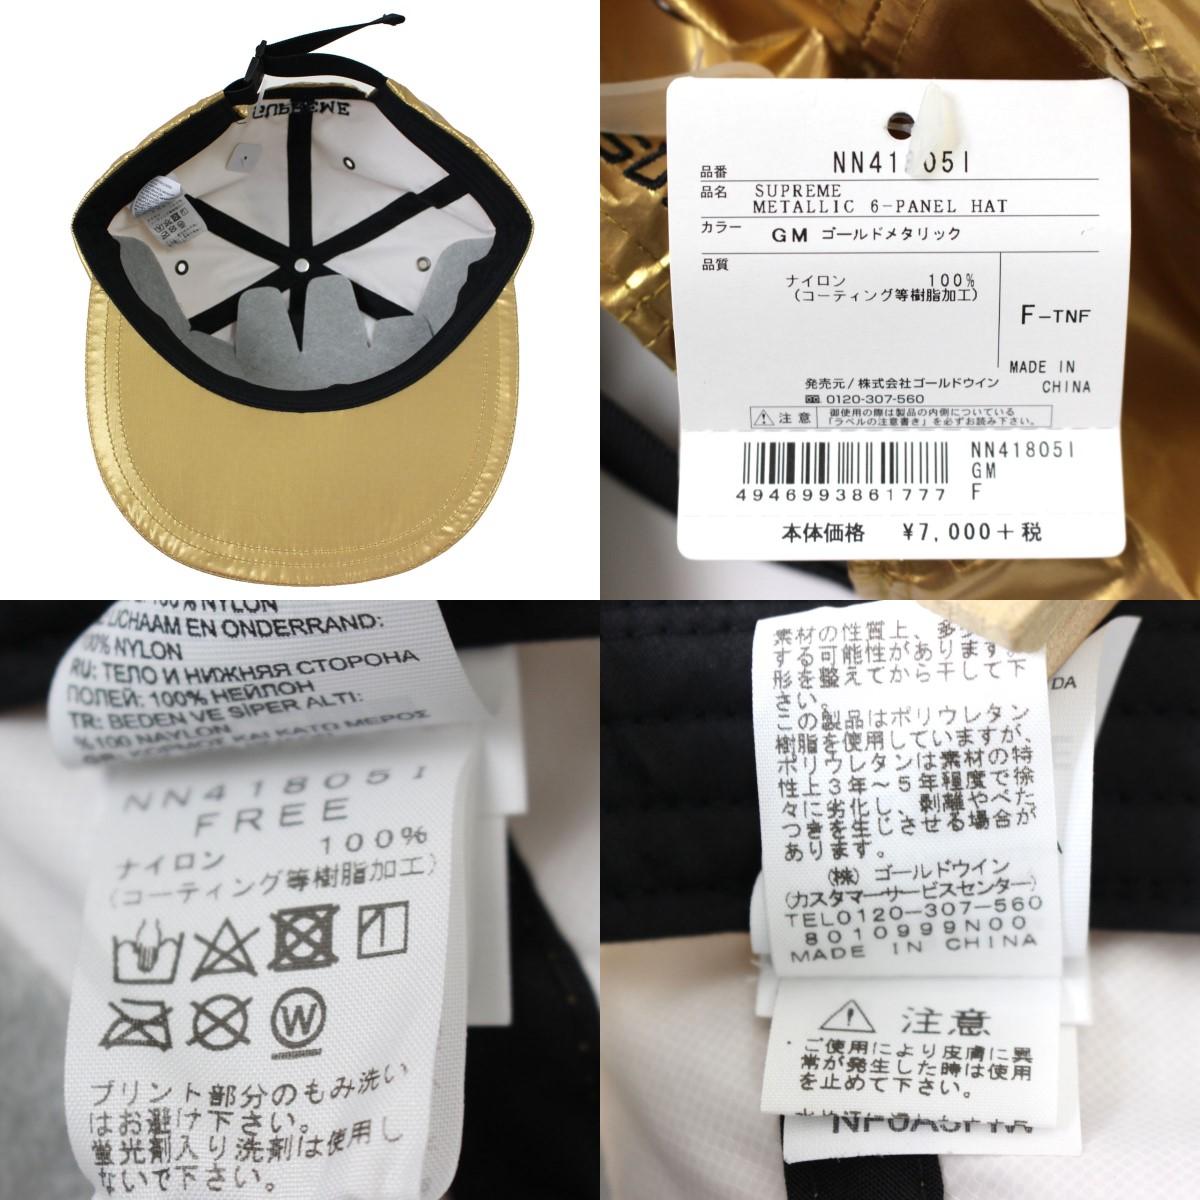 82f7fc44 ... Supreme X The North Face Metallic 6-Panel Cap 2018SS NN418051 metallic cap  hat gold ...